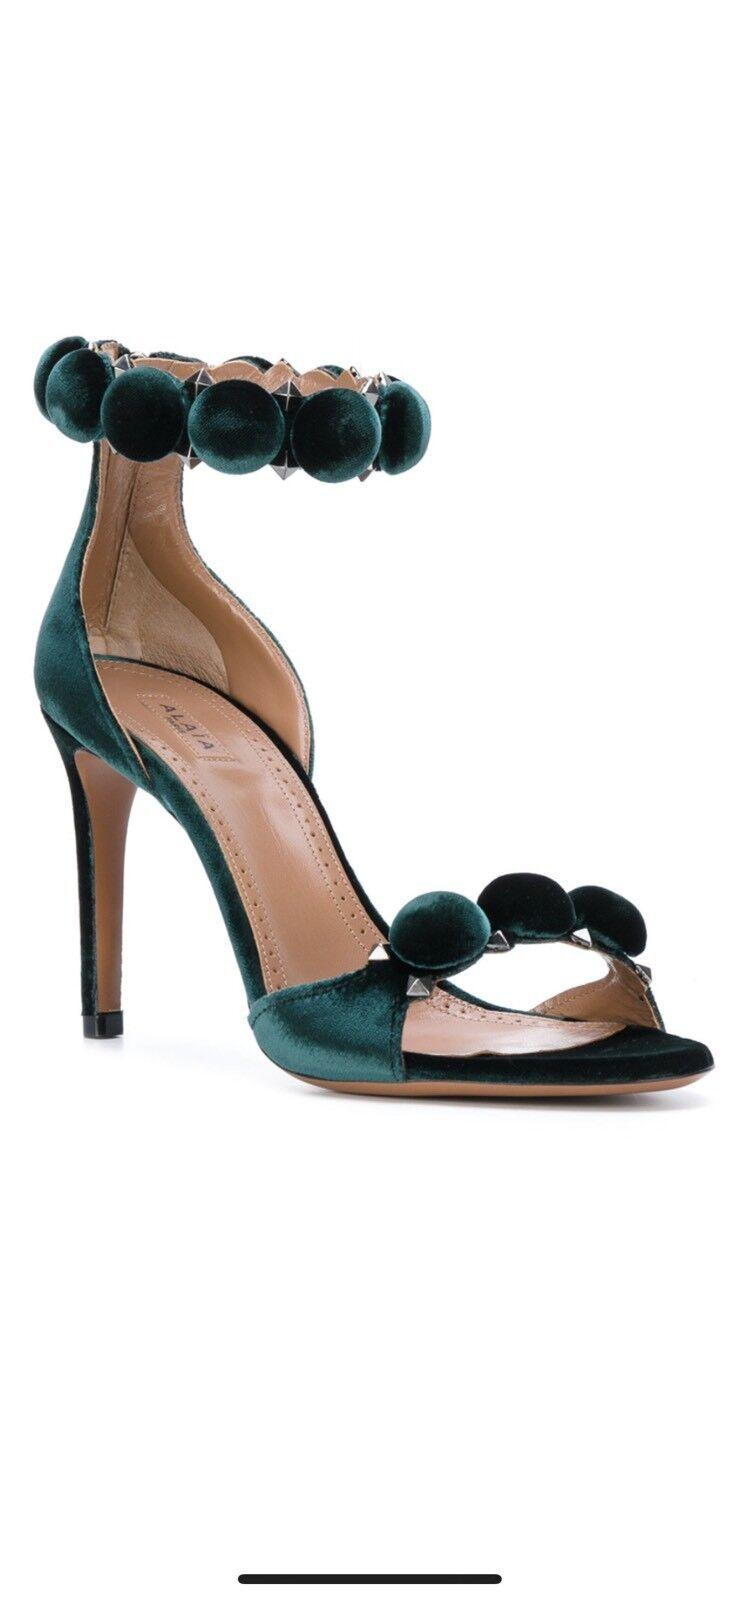 Alaia Alaia Alaia Bombe Studded Velvet Open Toe Sandals 37 a94137